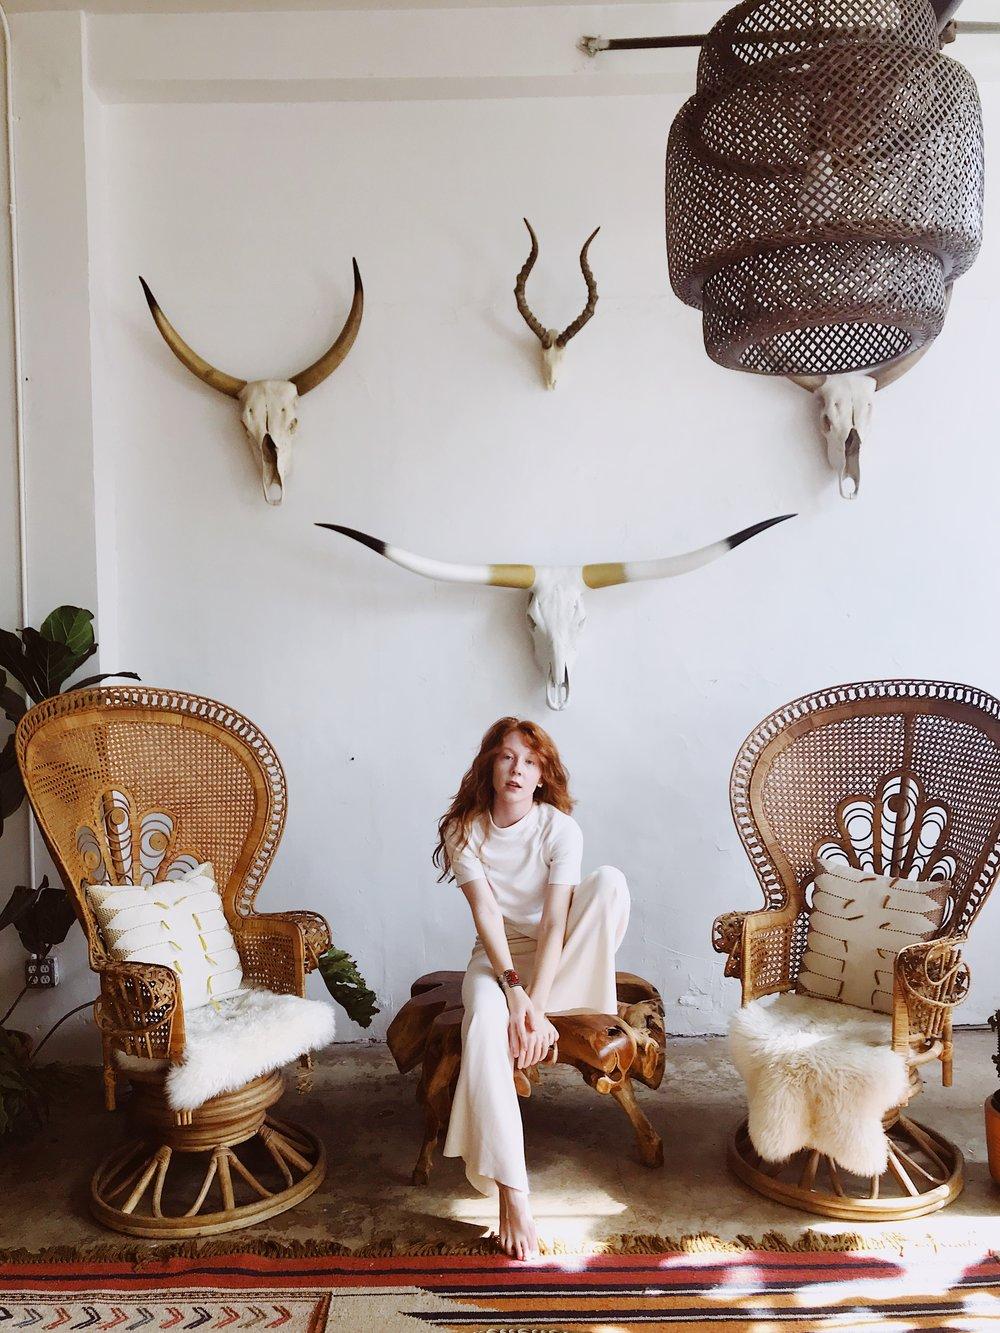 Glennellen, photographed by Noelle Williams, at the Urban Jungle Studio in Downtown LA. - TOP: ZARABOTTOMS: ZARA